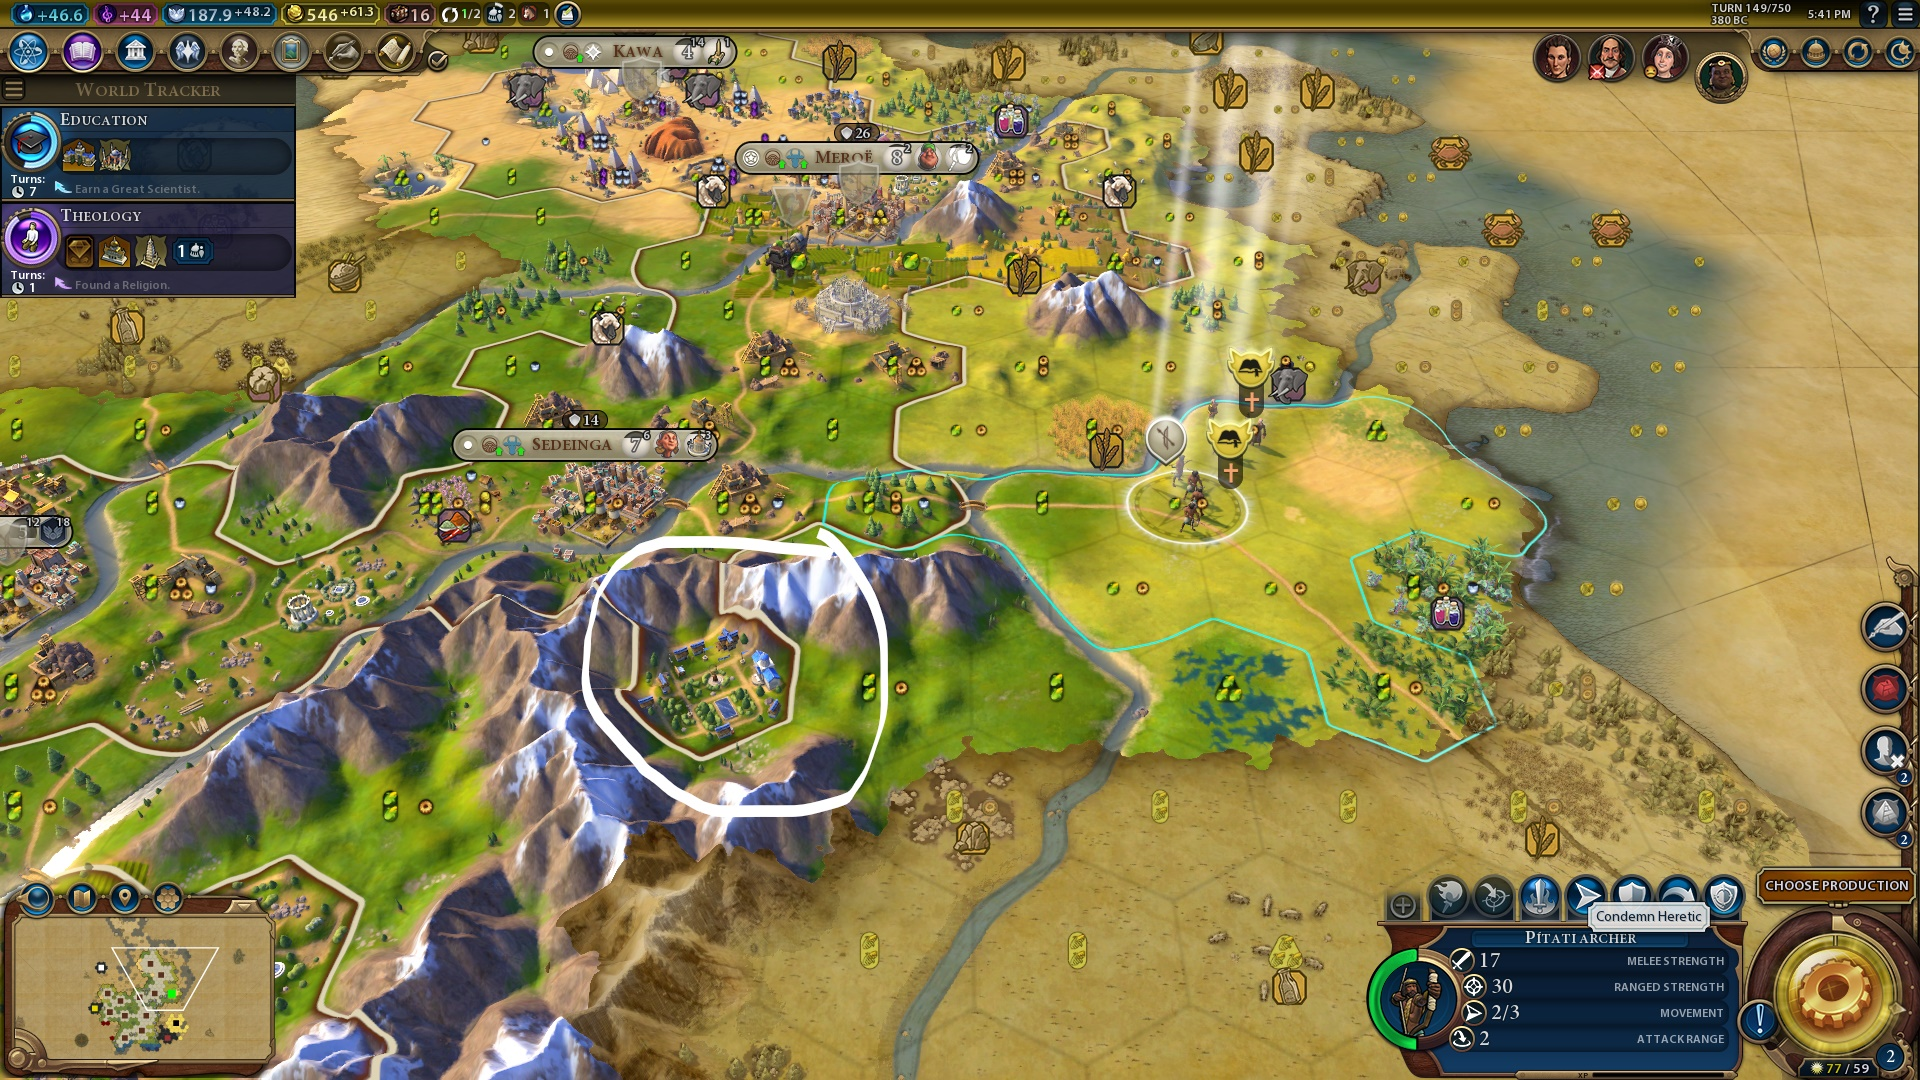 Sid Meier's Civilization VI (DX11) 6_10_2018 5_41_53 PM_LI.jpg